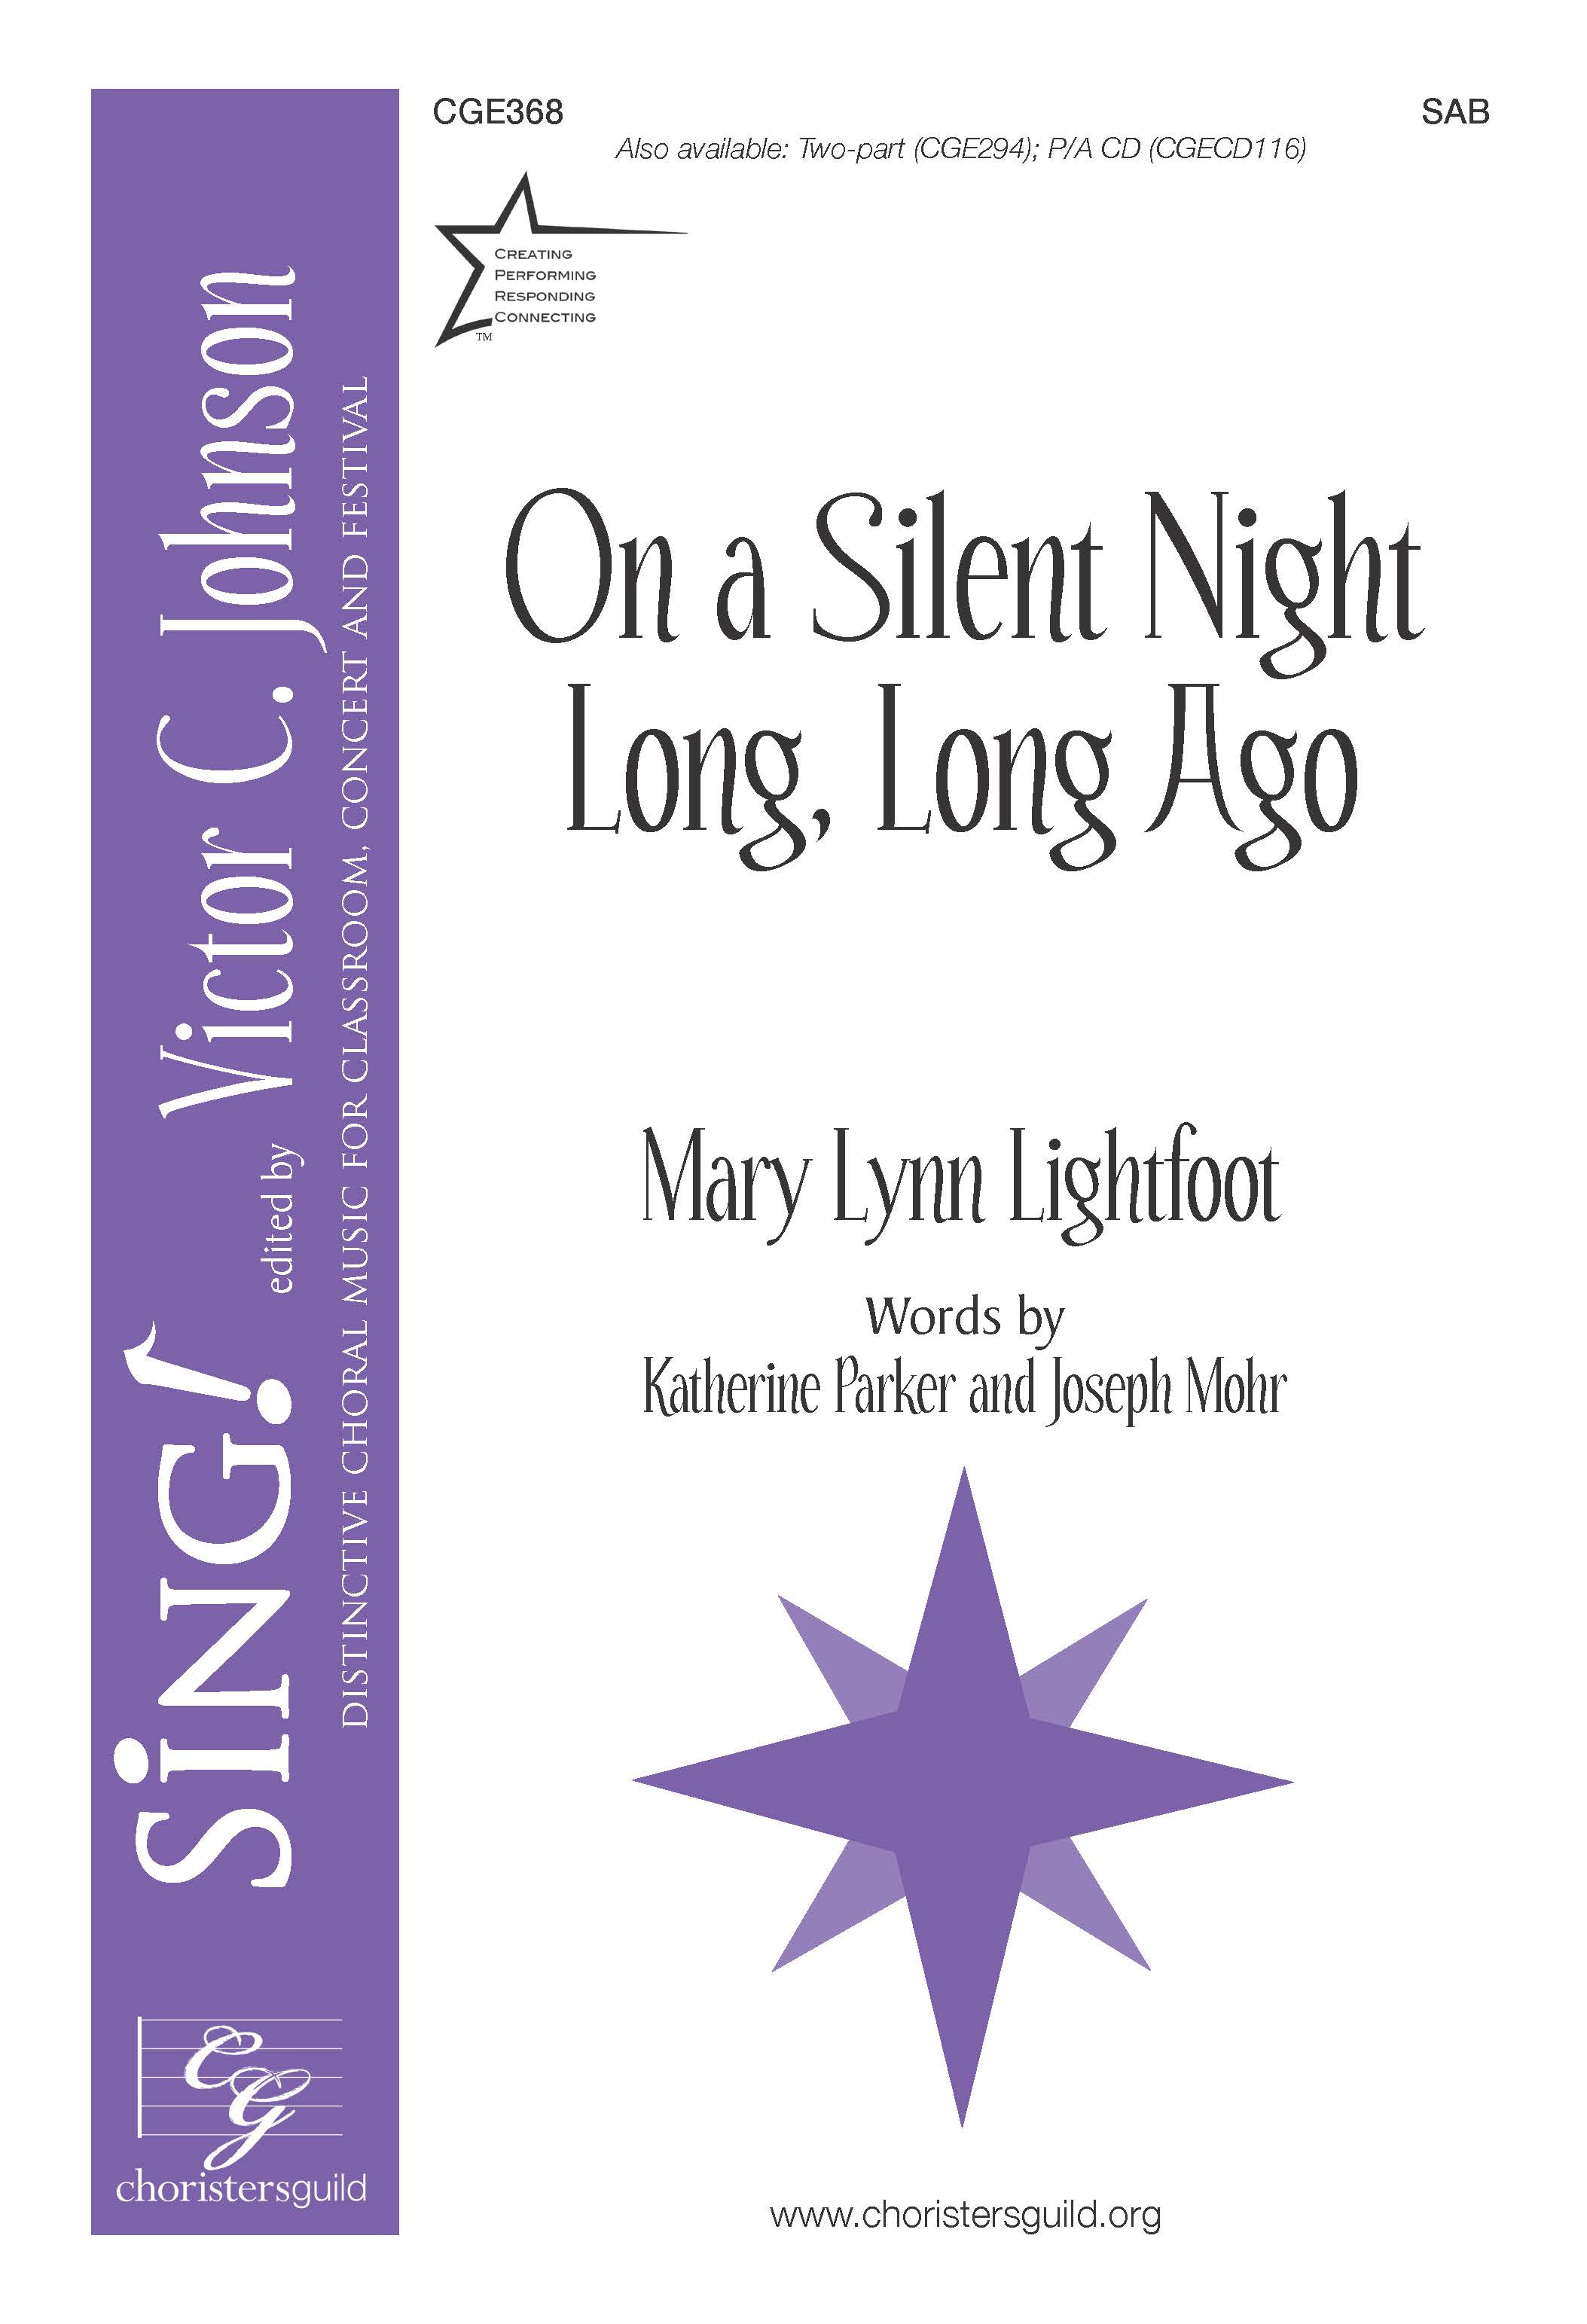 On A Silent Night, Long, Long Ago - SAB